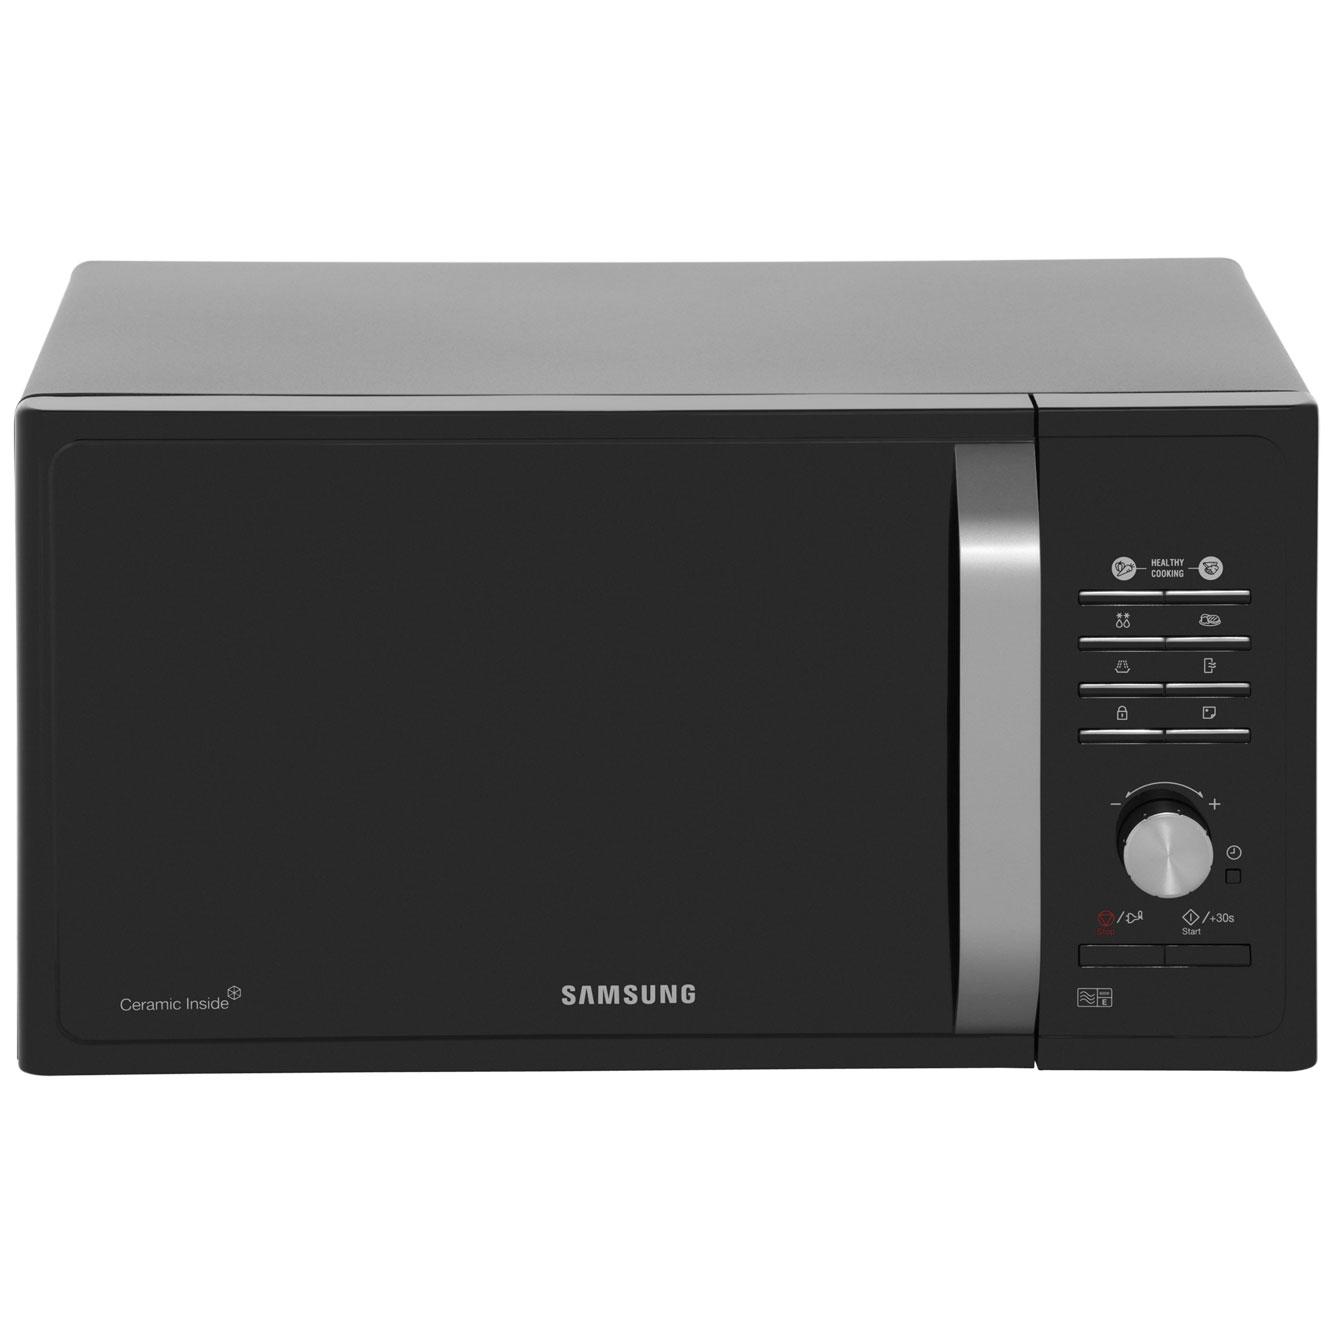 Samsung microwave oven | Black